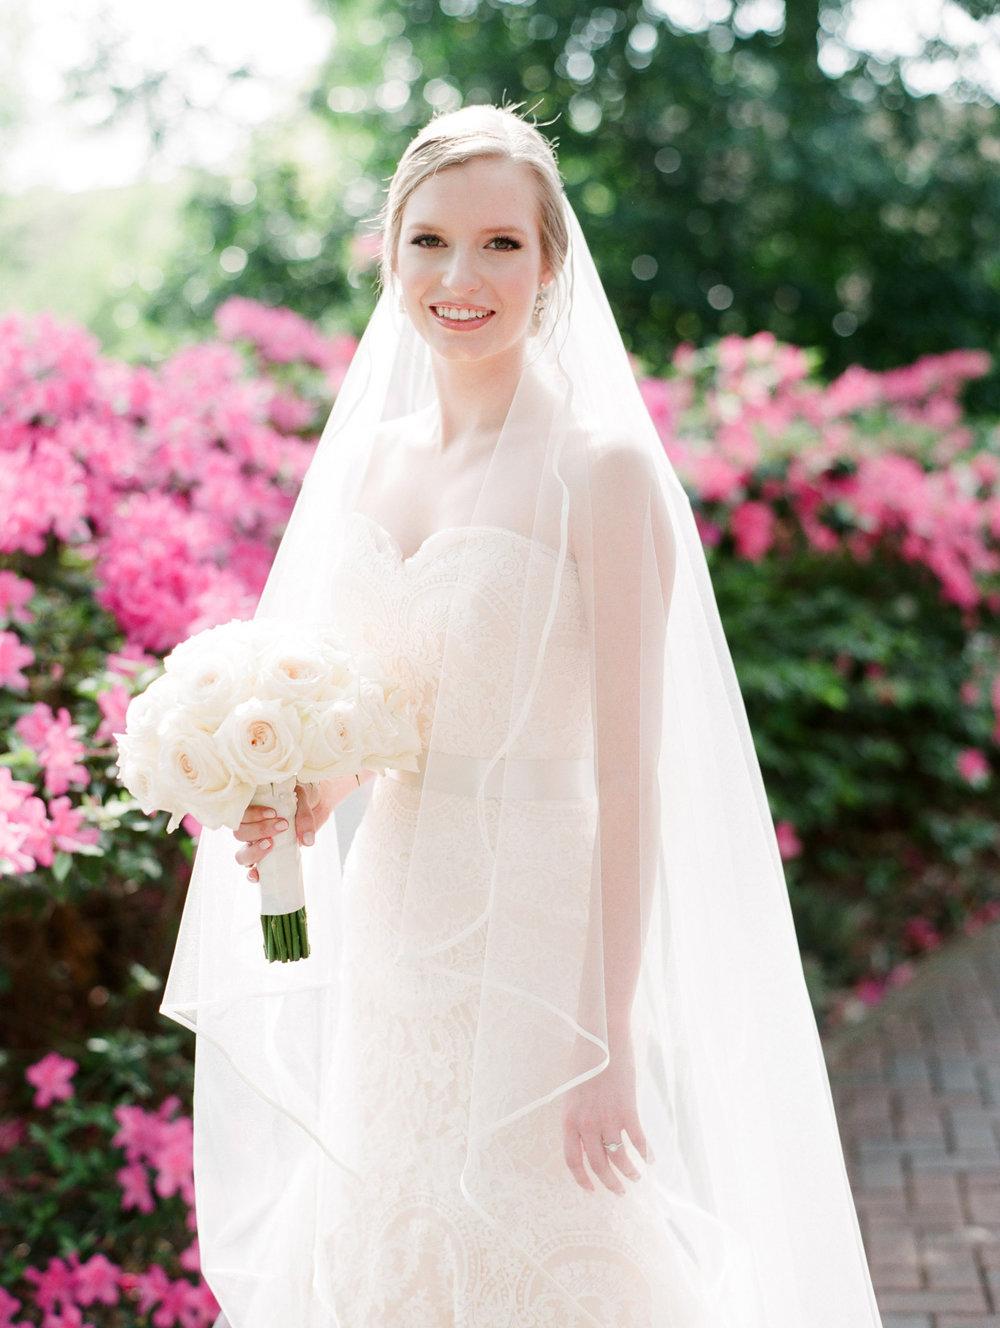 0100_0085_Houston-Film-Bridal-Photographer.jpg